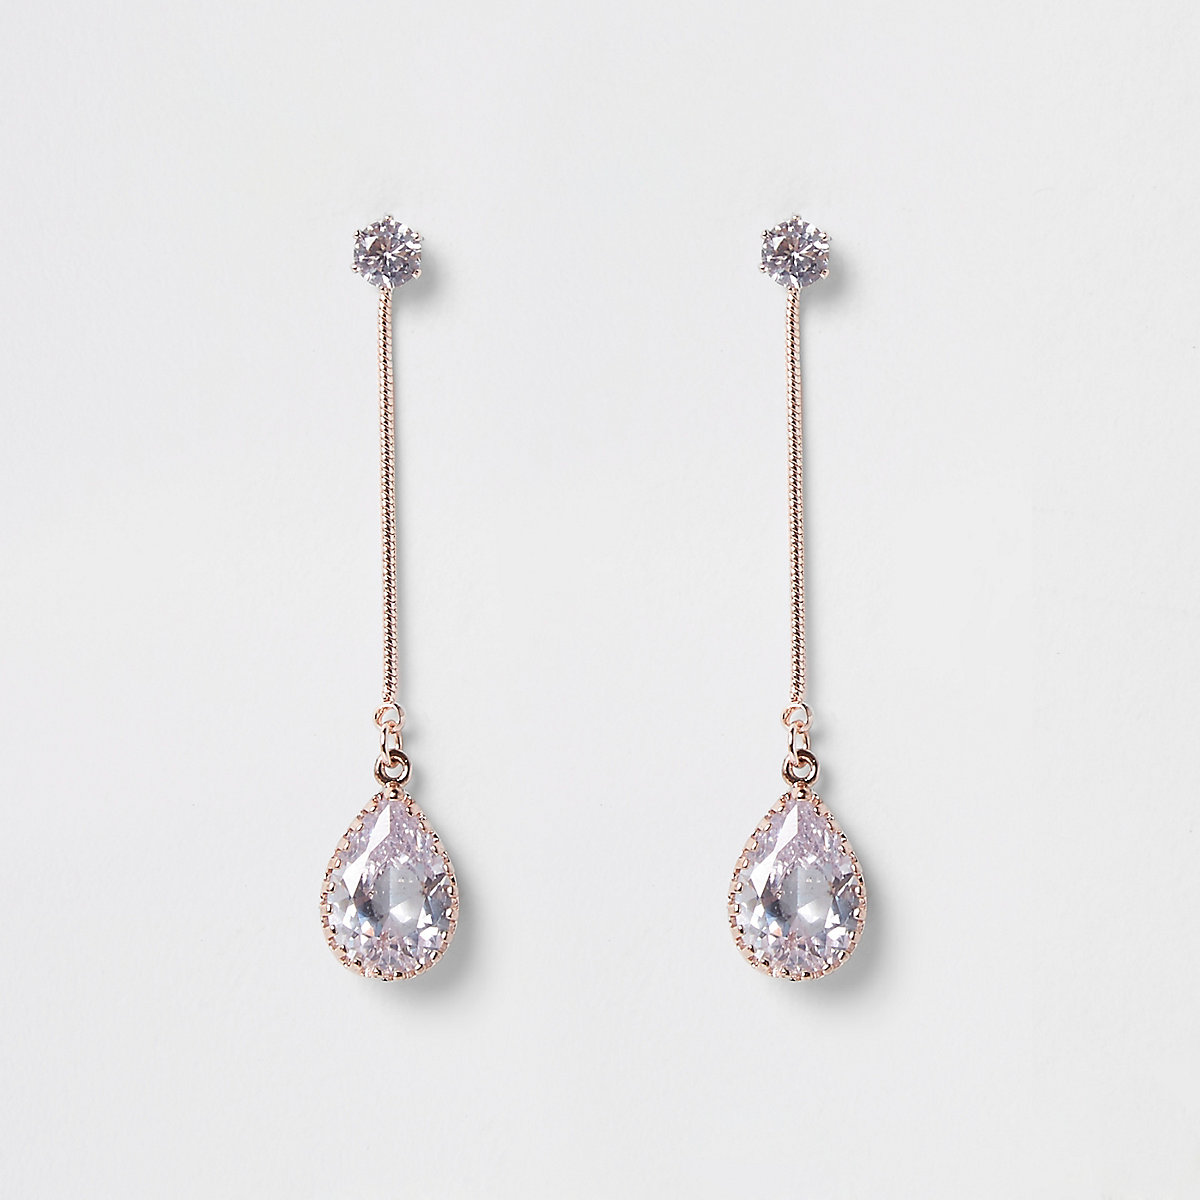 Rose gold tone cubic zirconia drop earrings